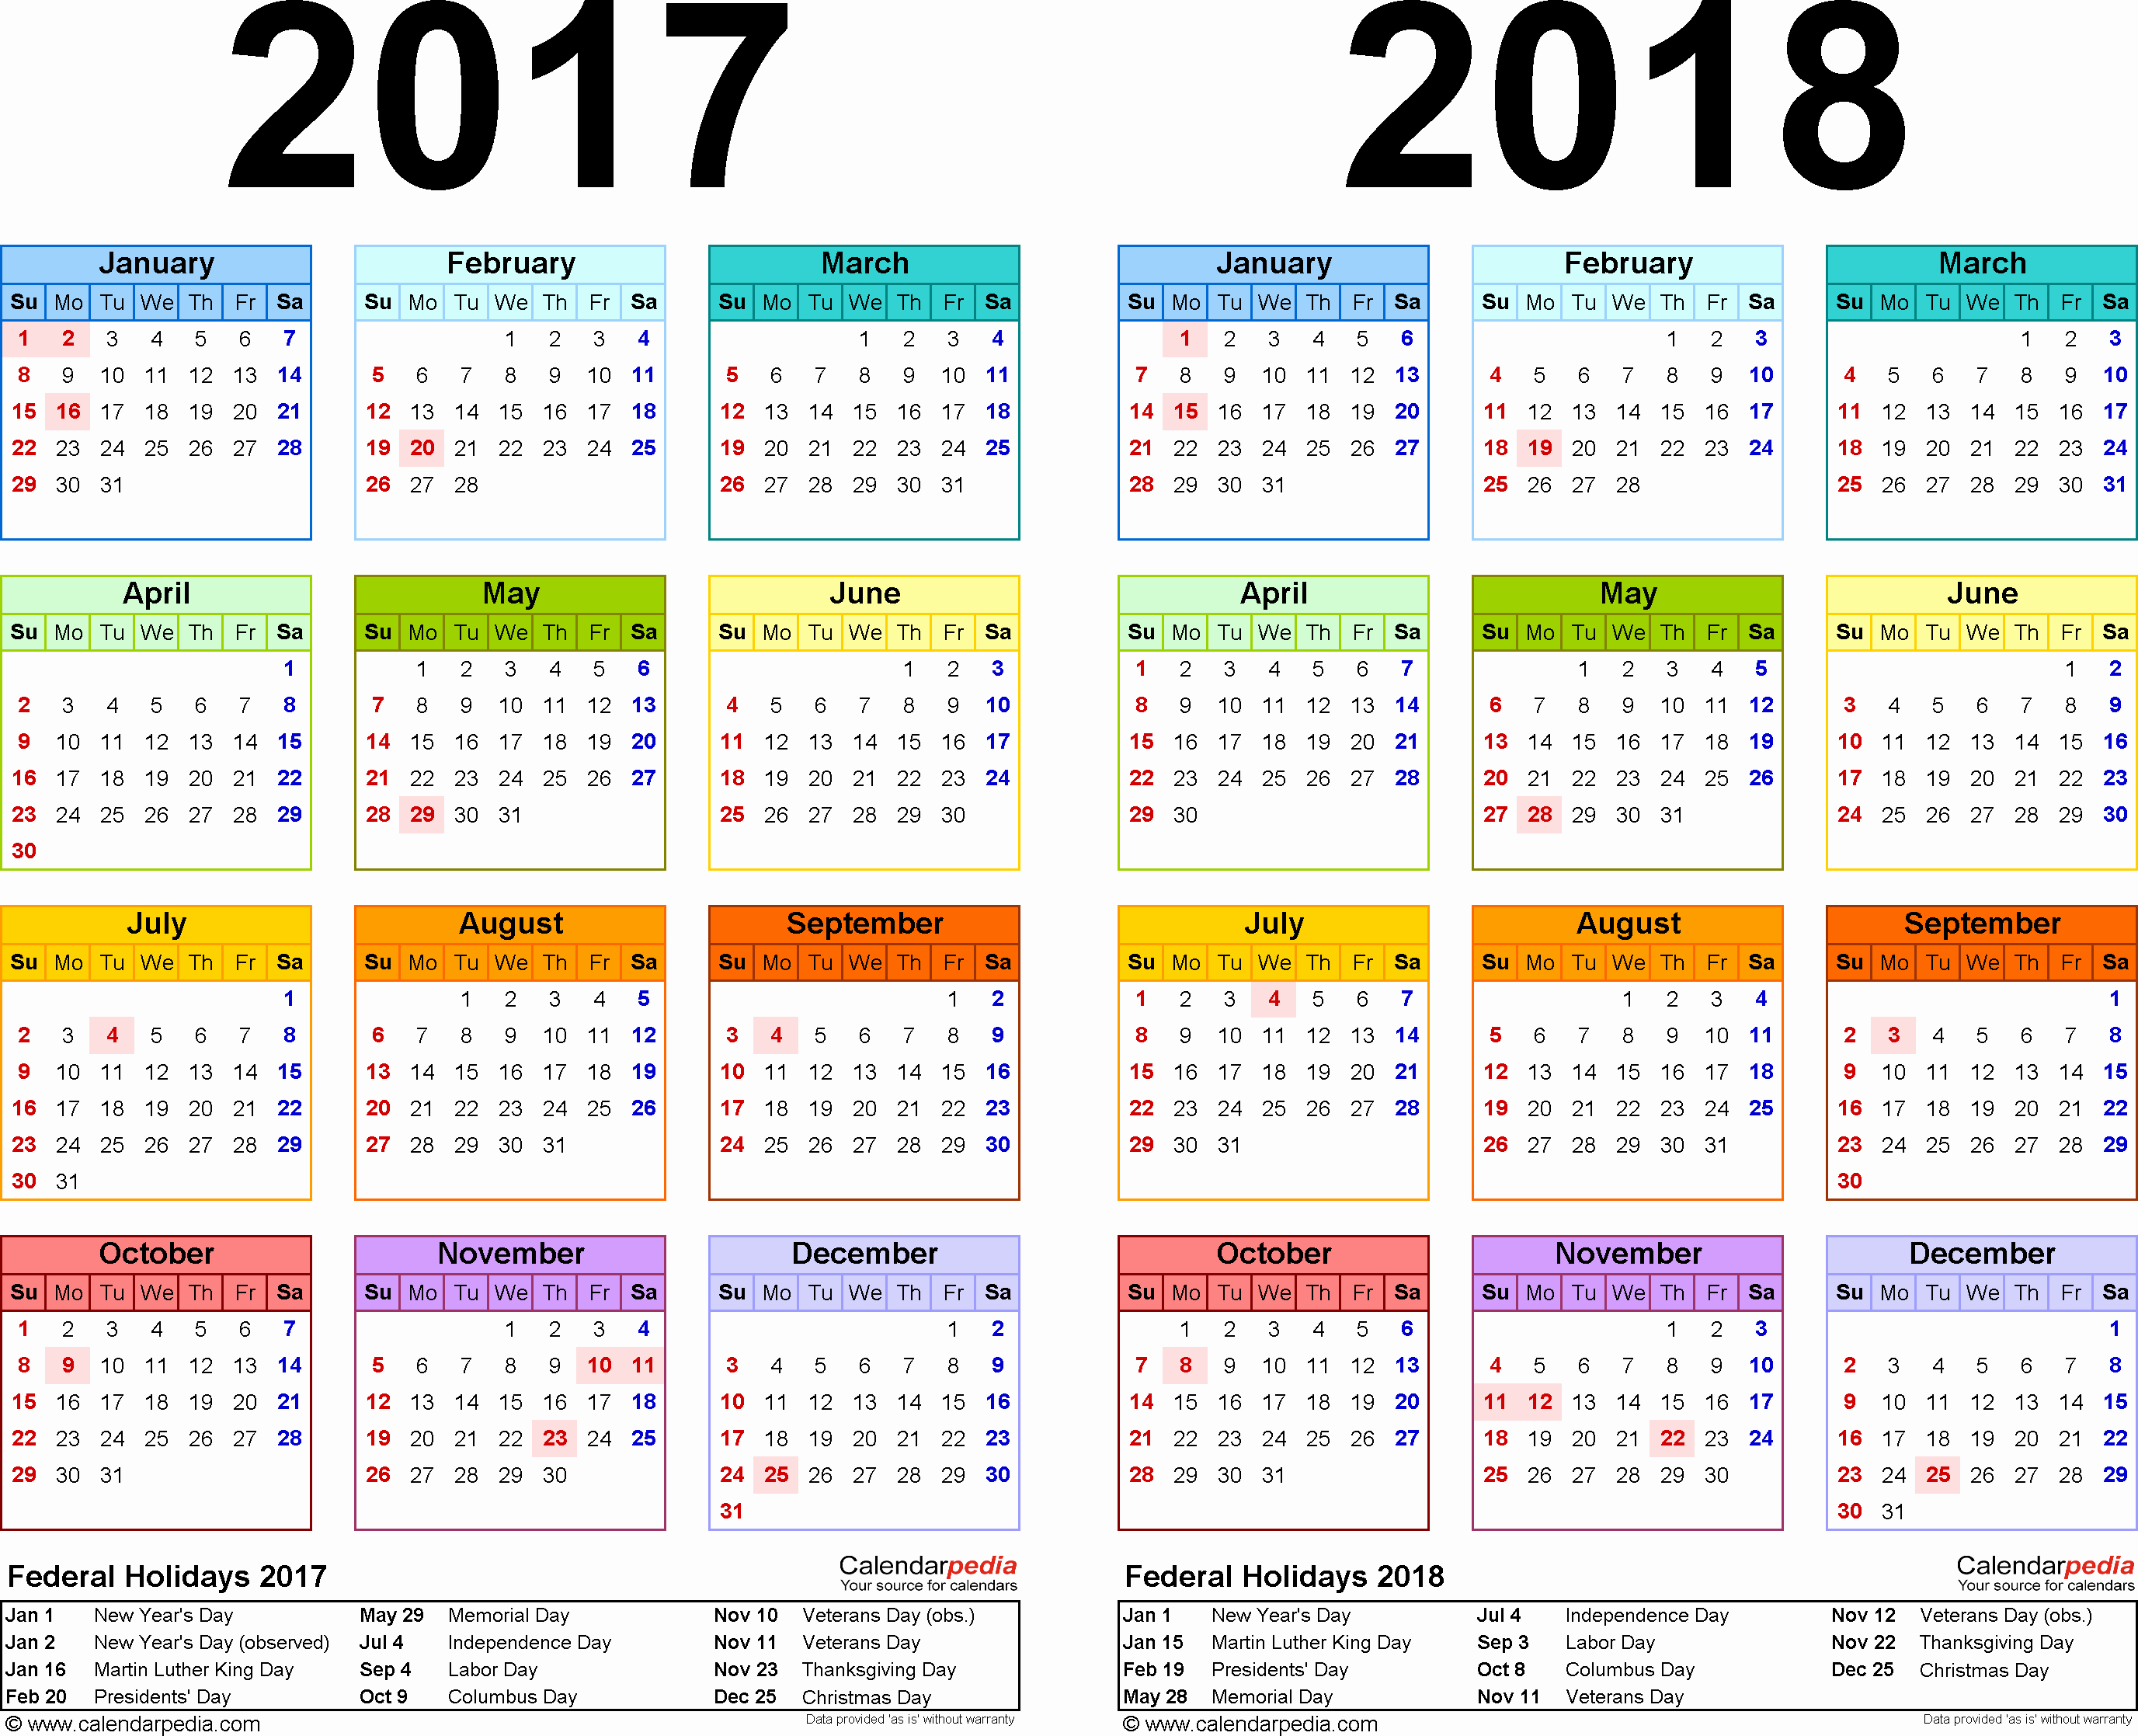 2017 Full Year Calendar Template New 2017 2018 Calendar Free Printable Two Year Pdf Calendars